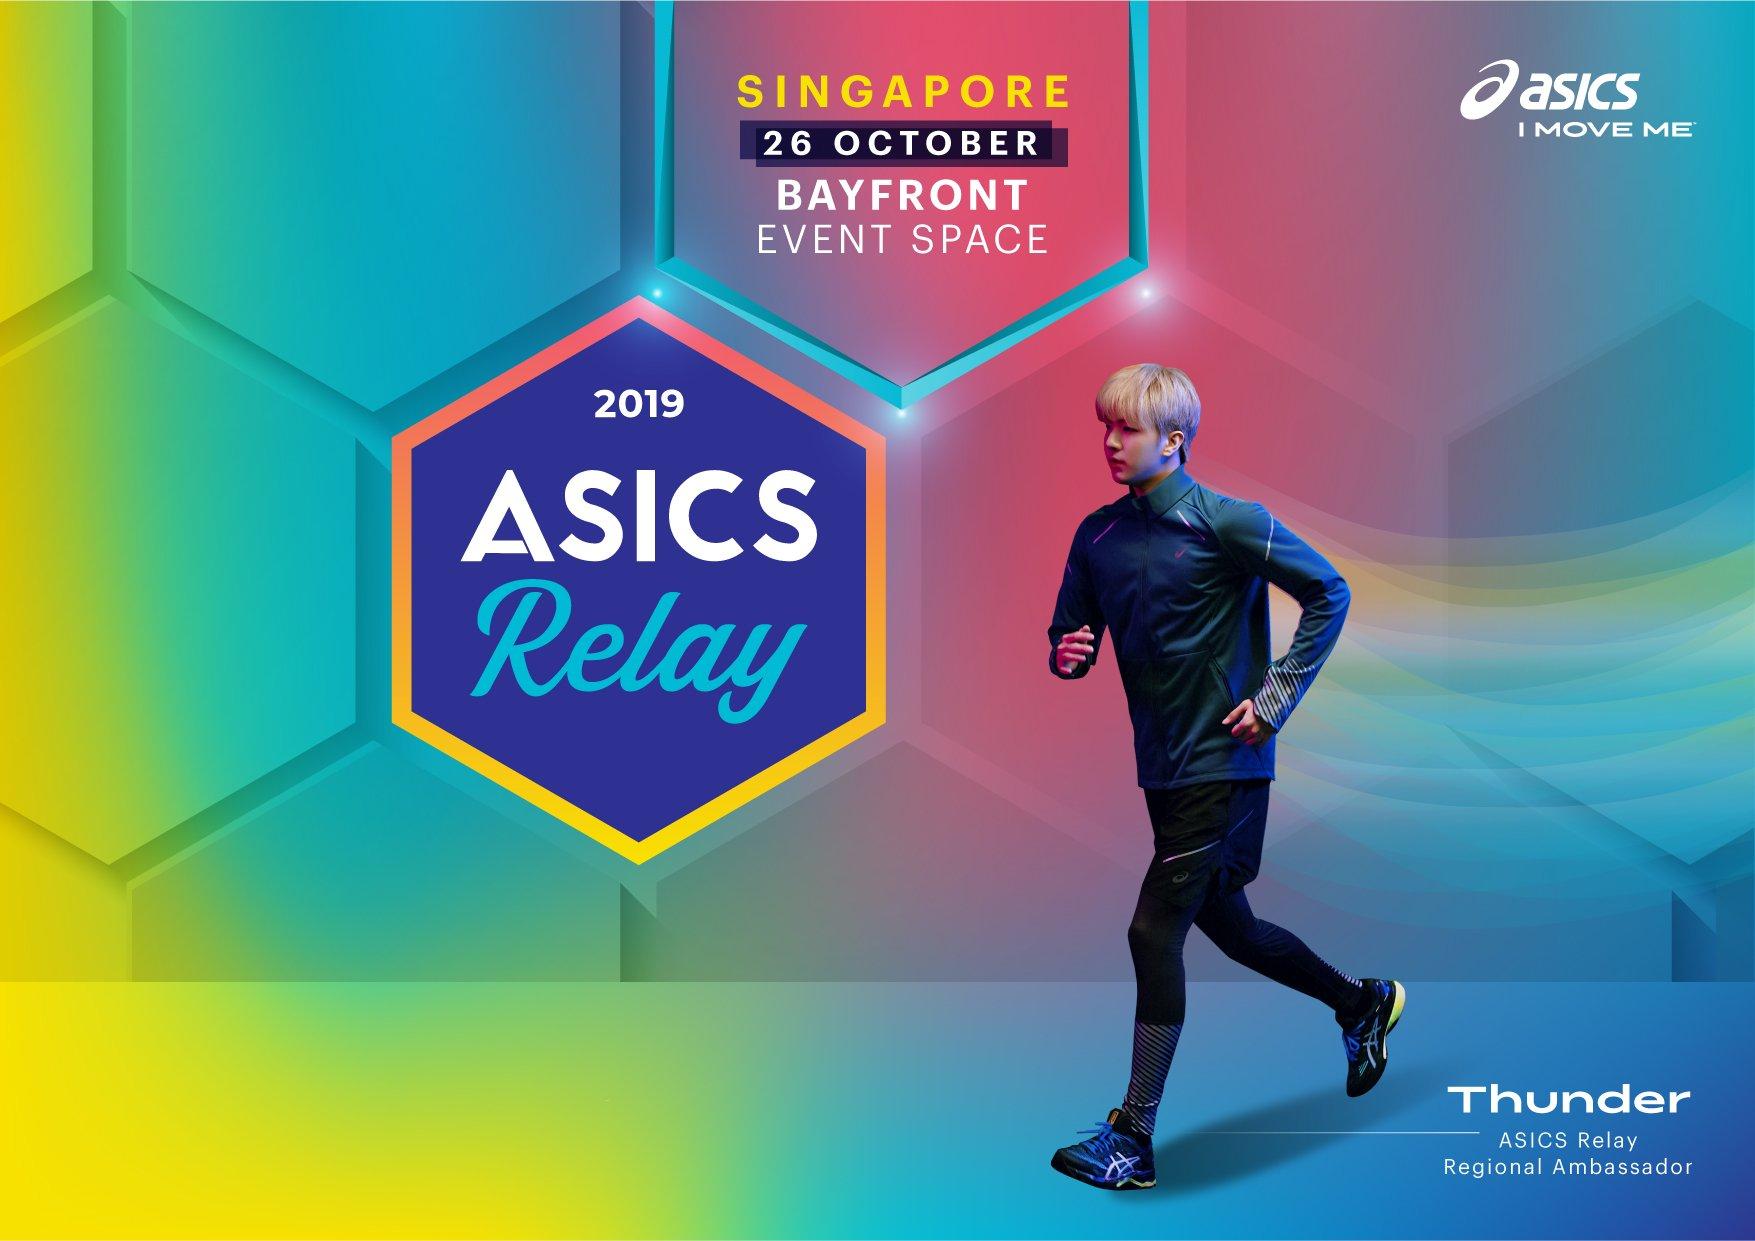 Interview] ASICS RELAY 2019 Ambassador, Thunder Shares